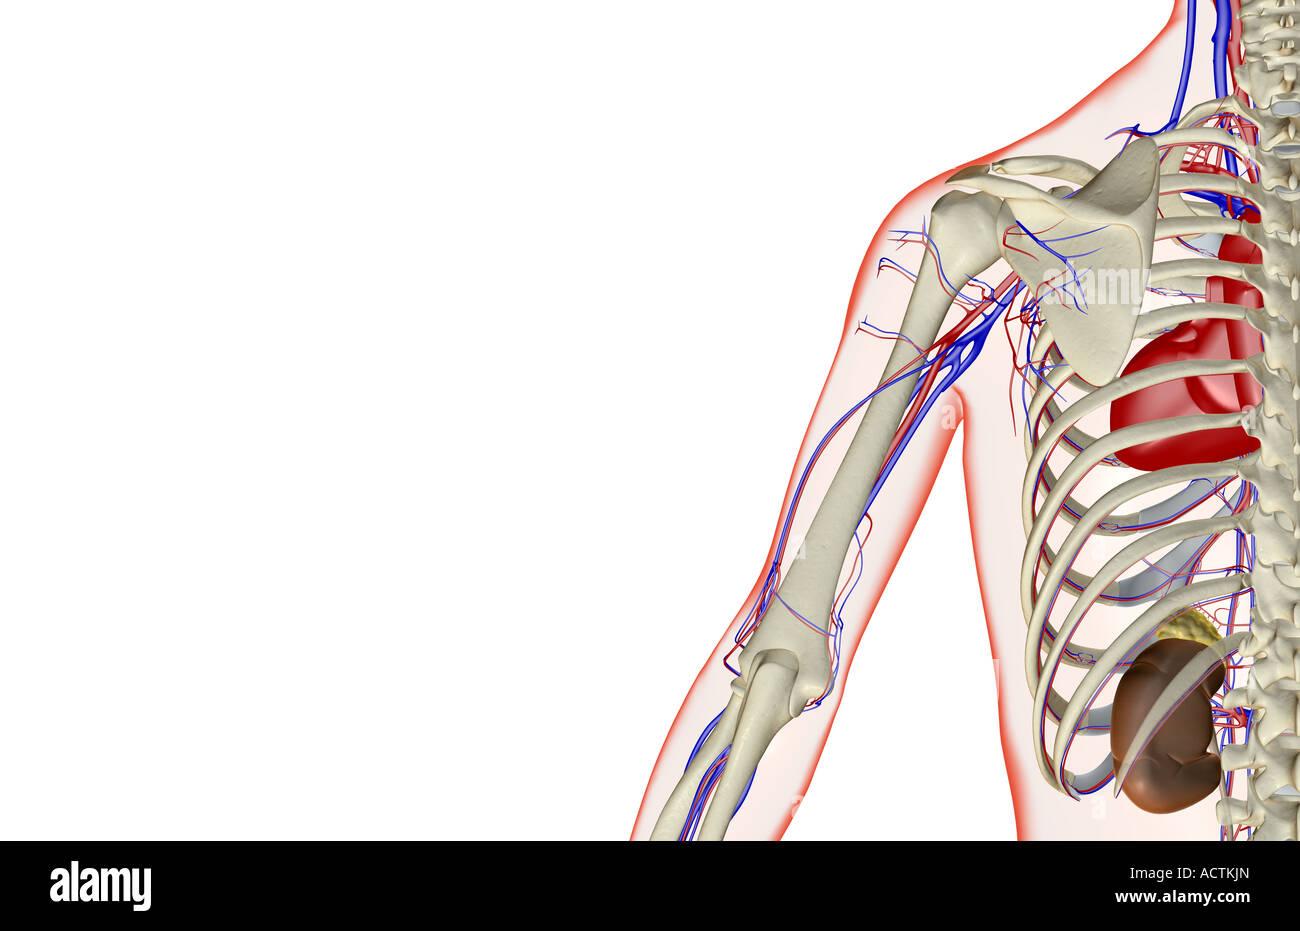 Adrenal Glands Stockfotos & Adrenal Glands Bilder - Alamy